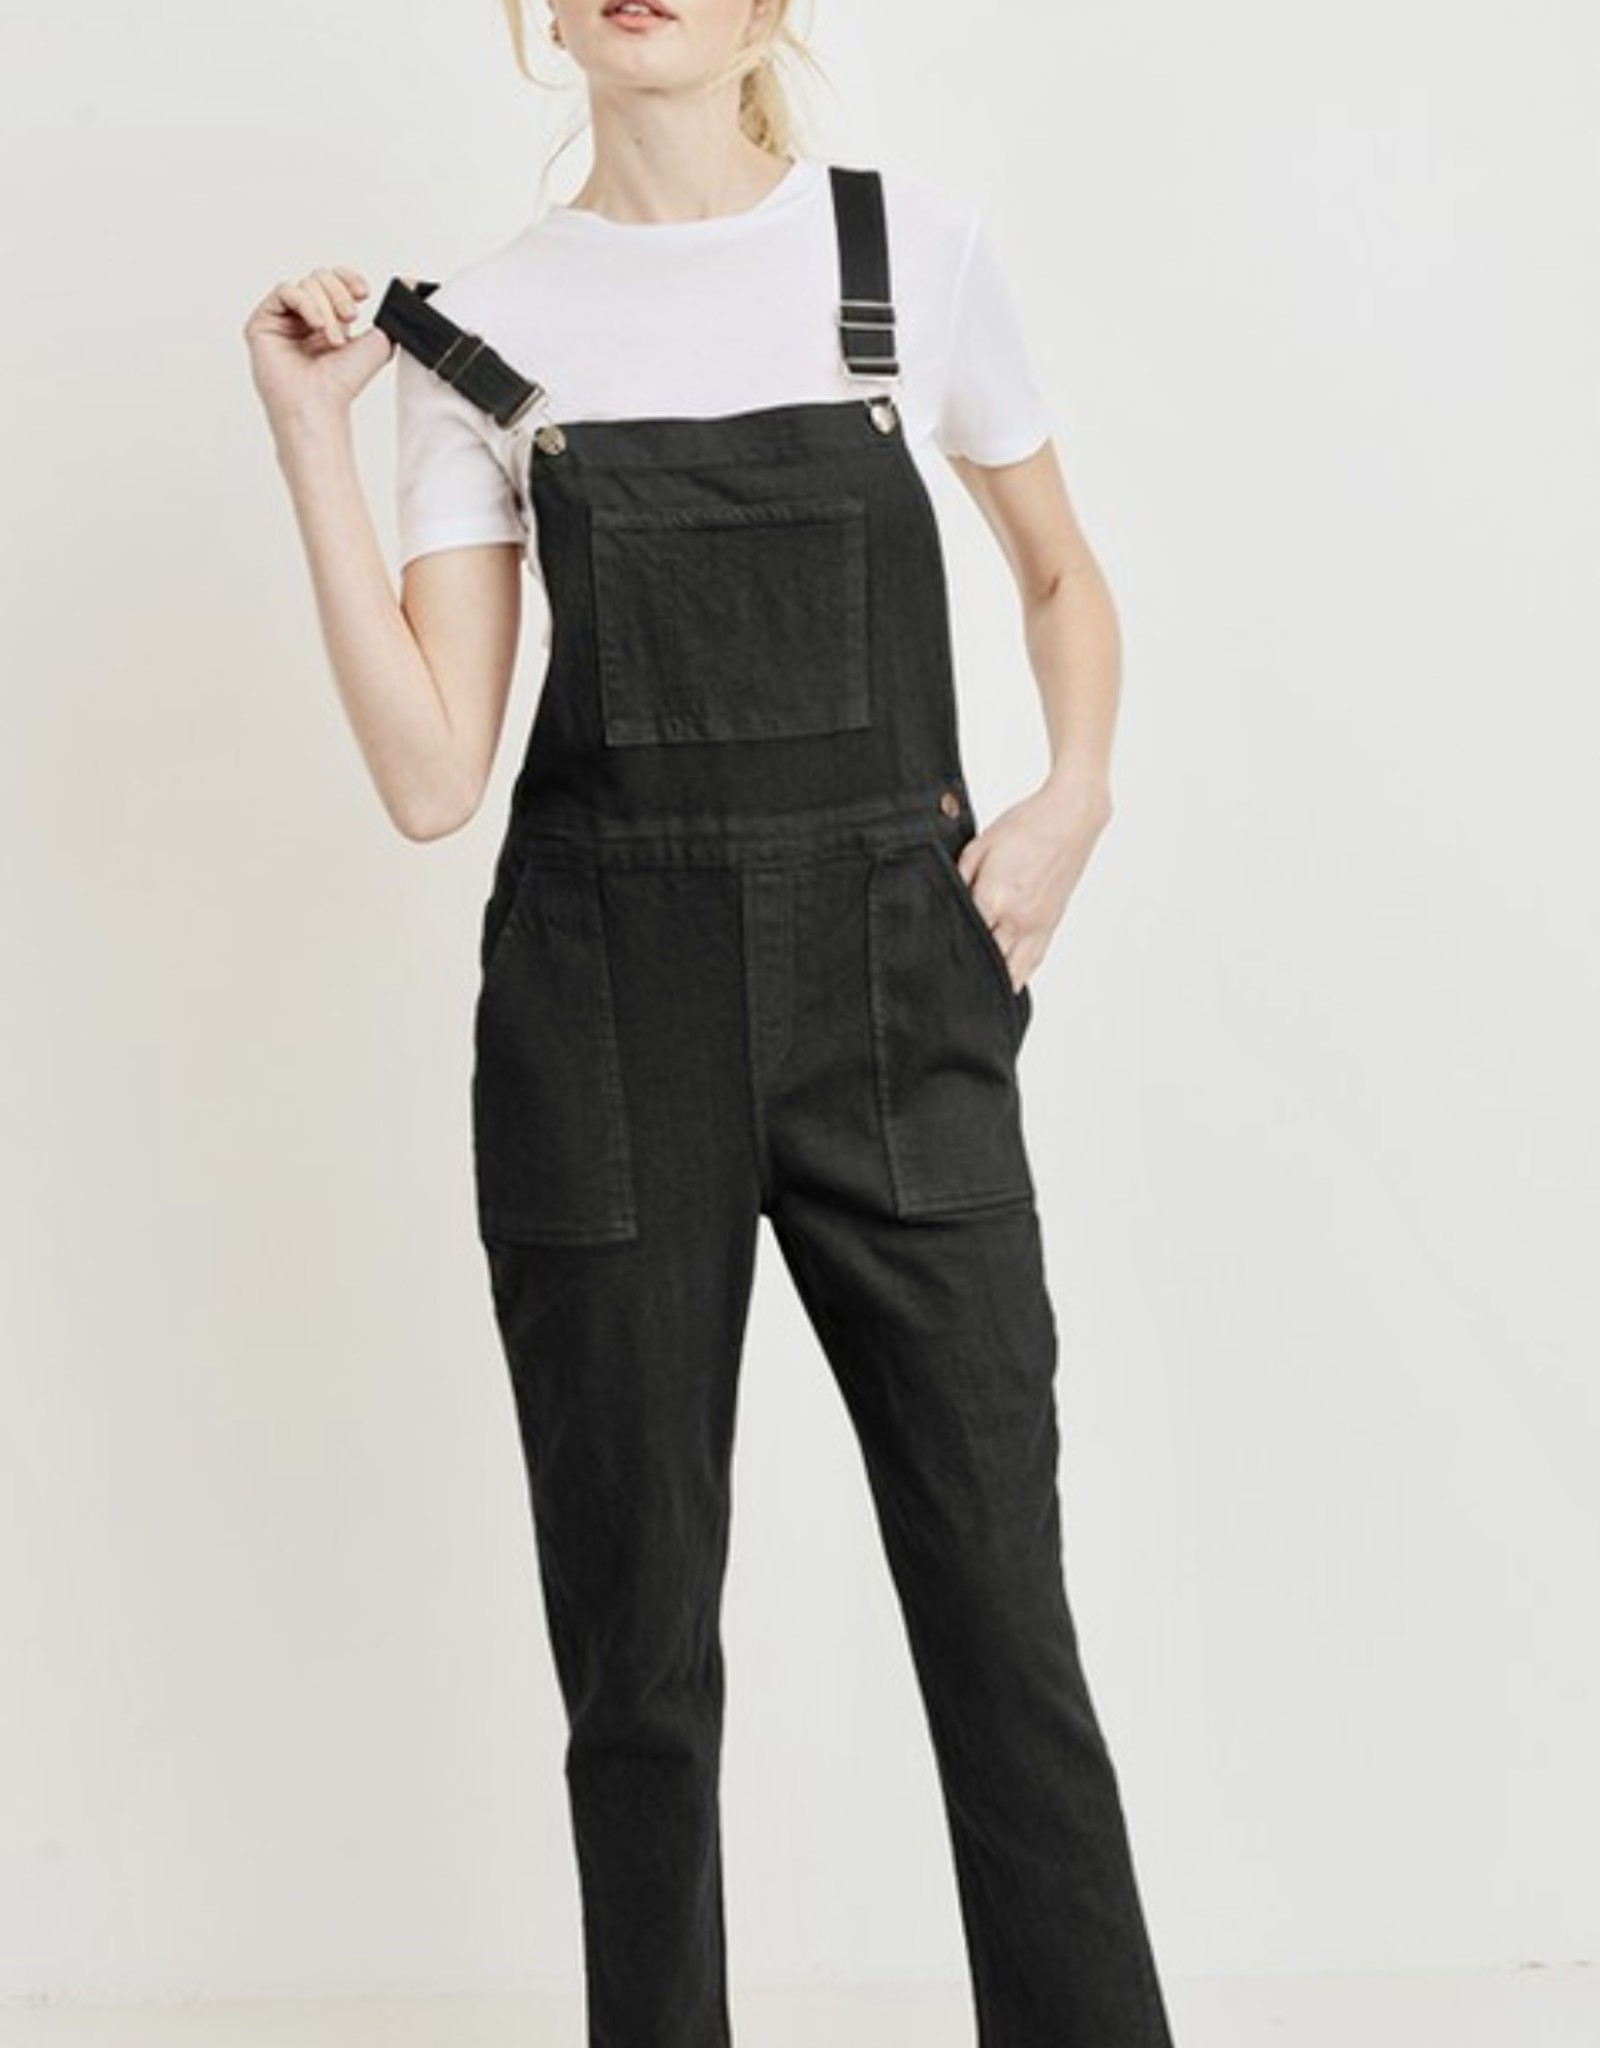 HUSH 90's style straight leg denim overalls